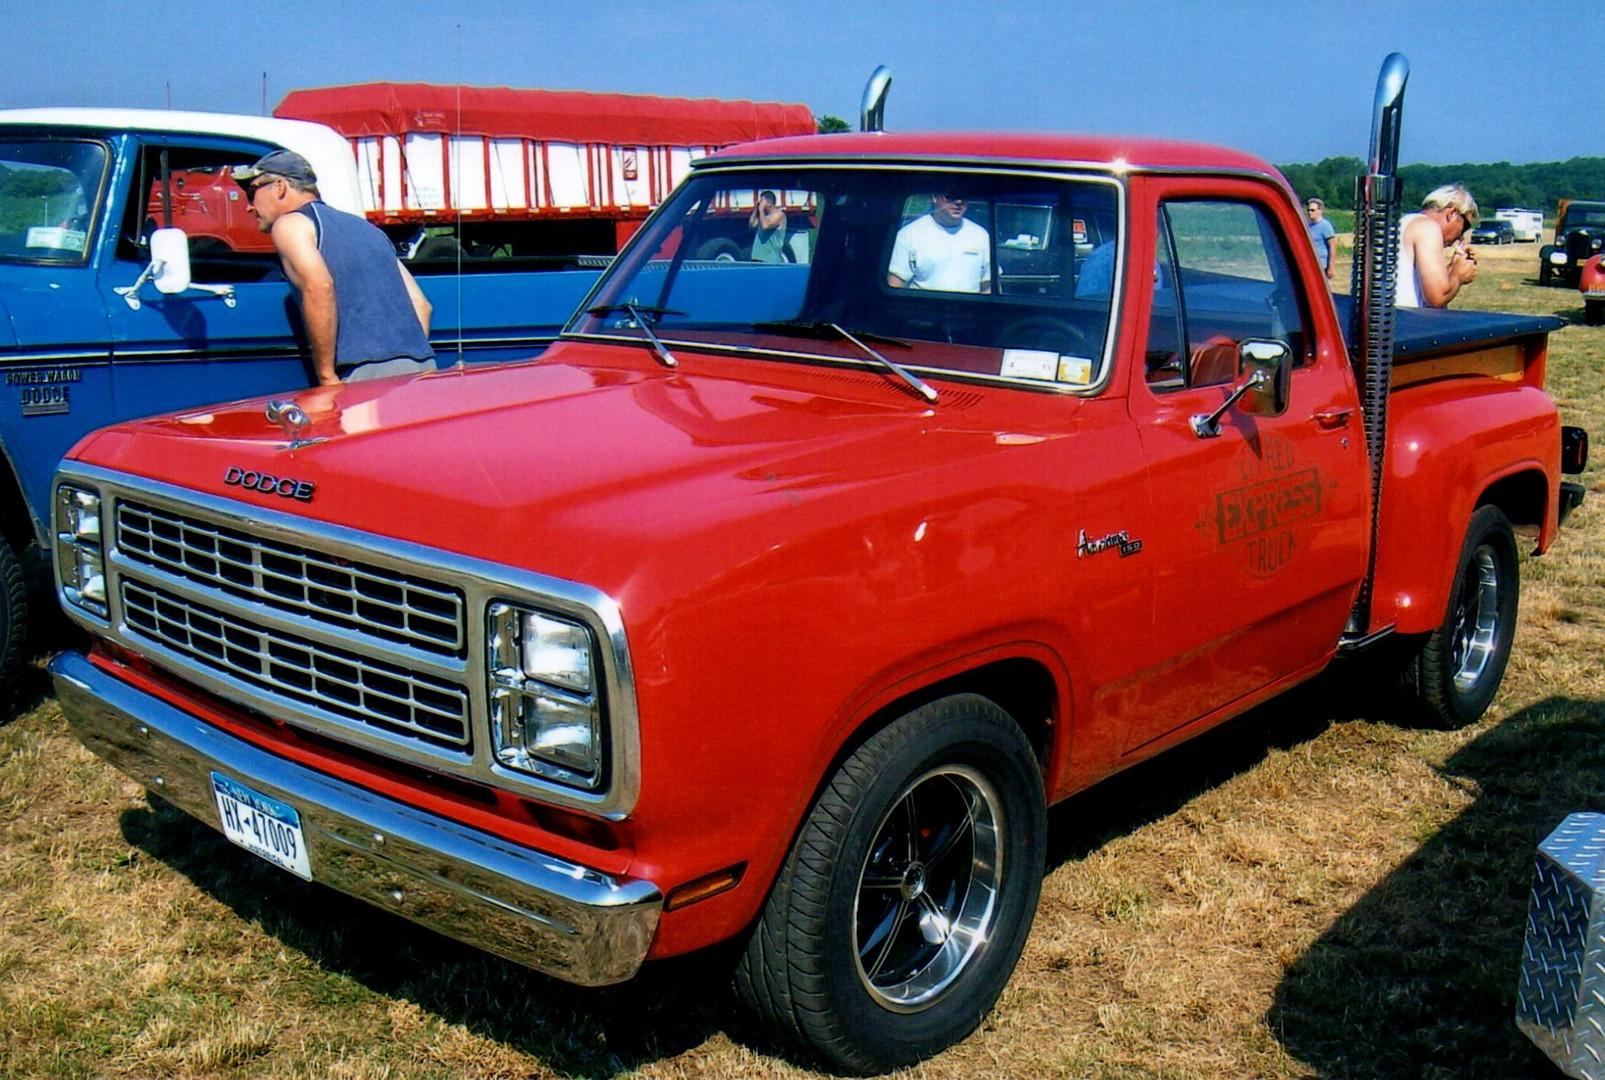 1979 Dodge Little Red Express pickup - Glenn Ketcham